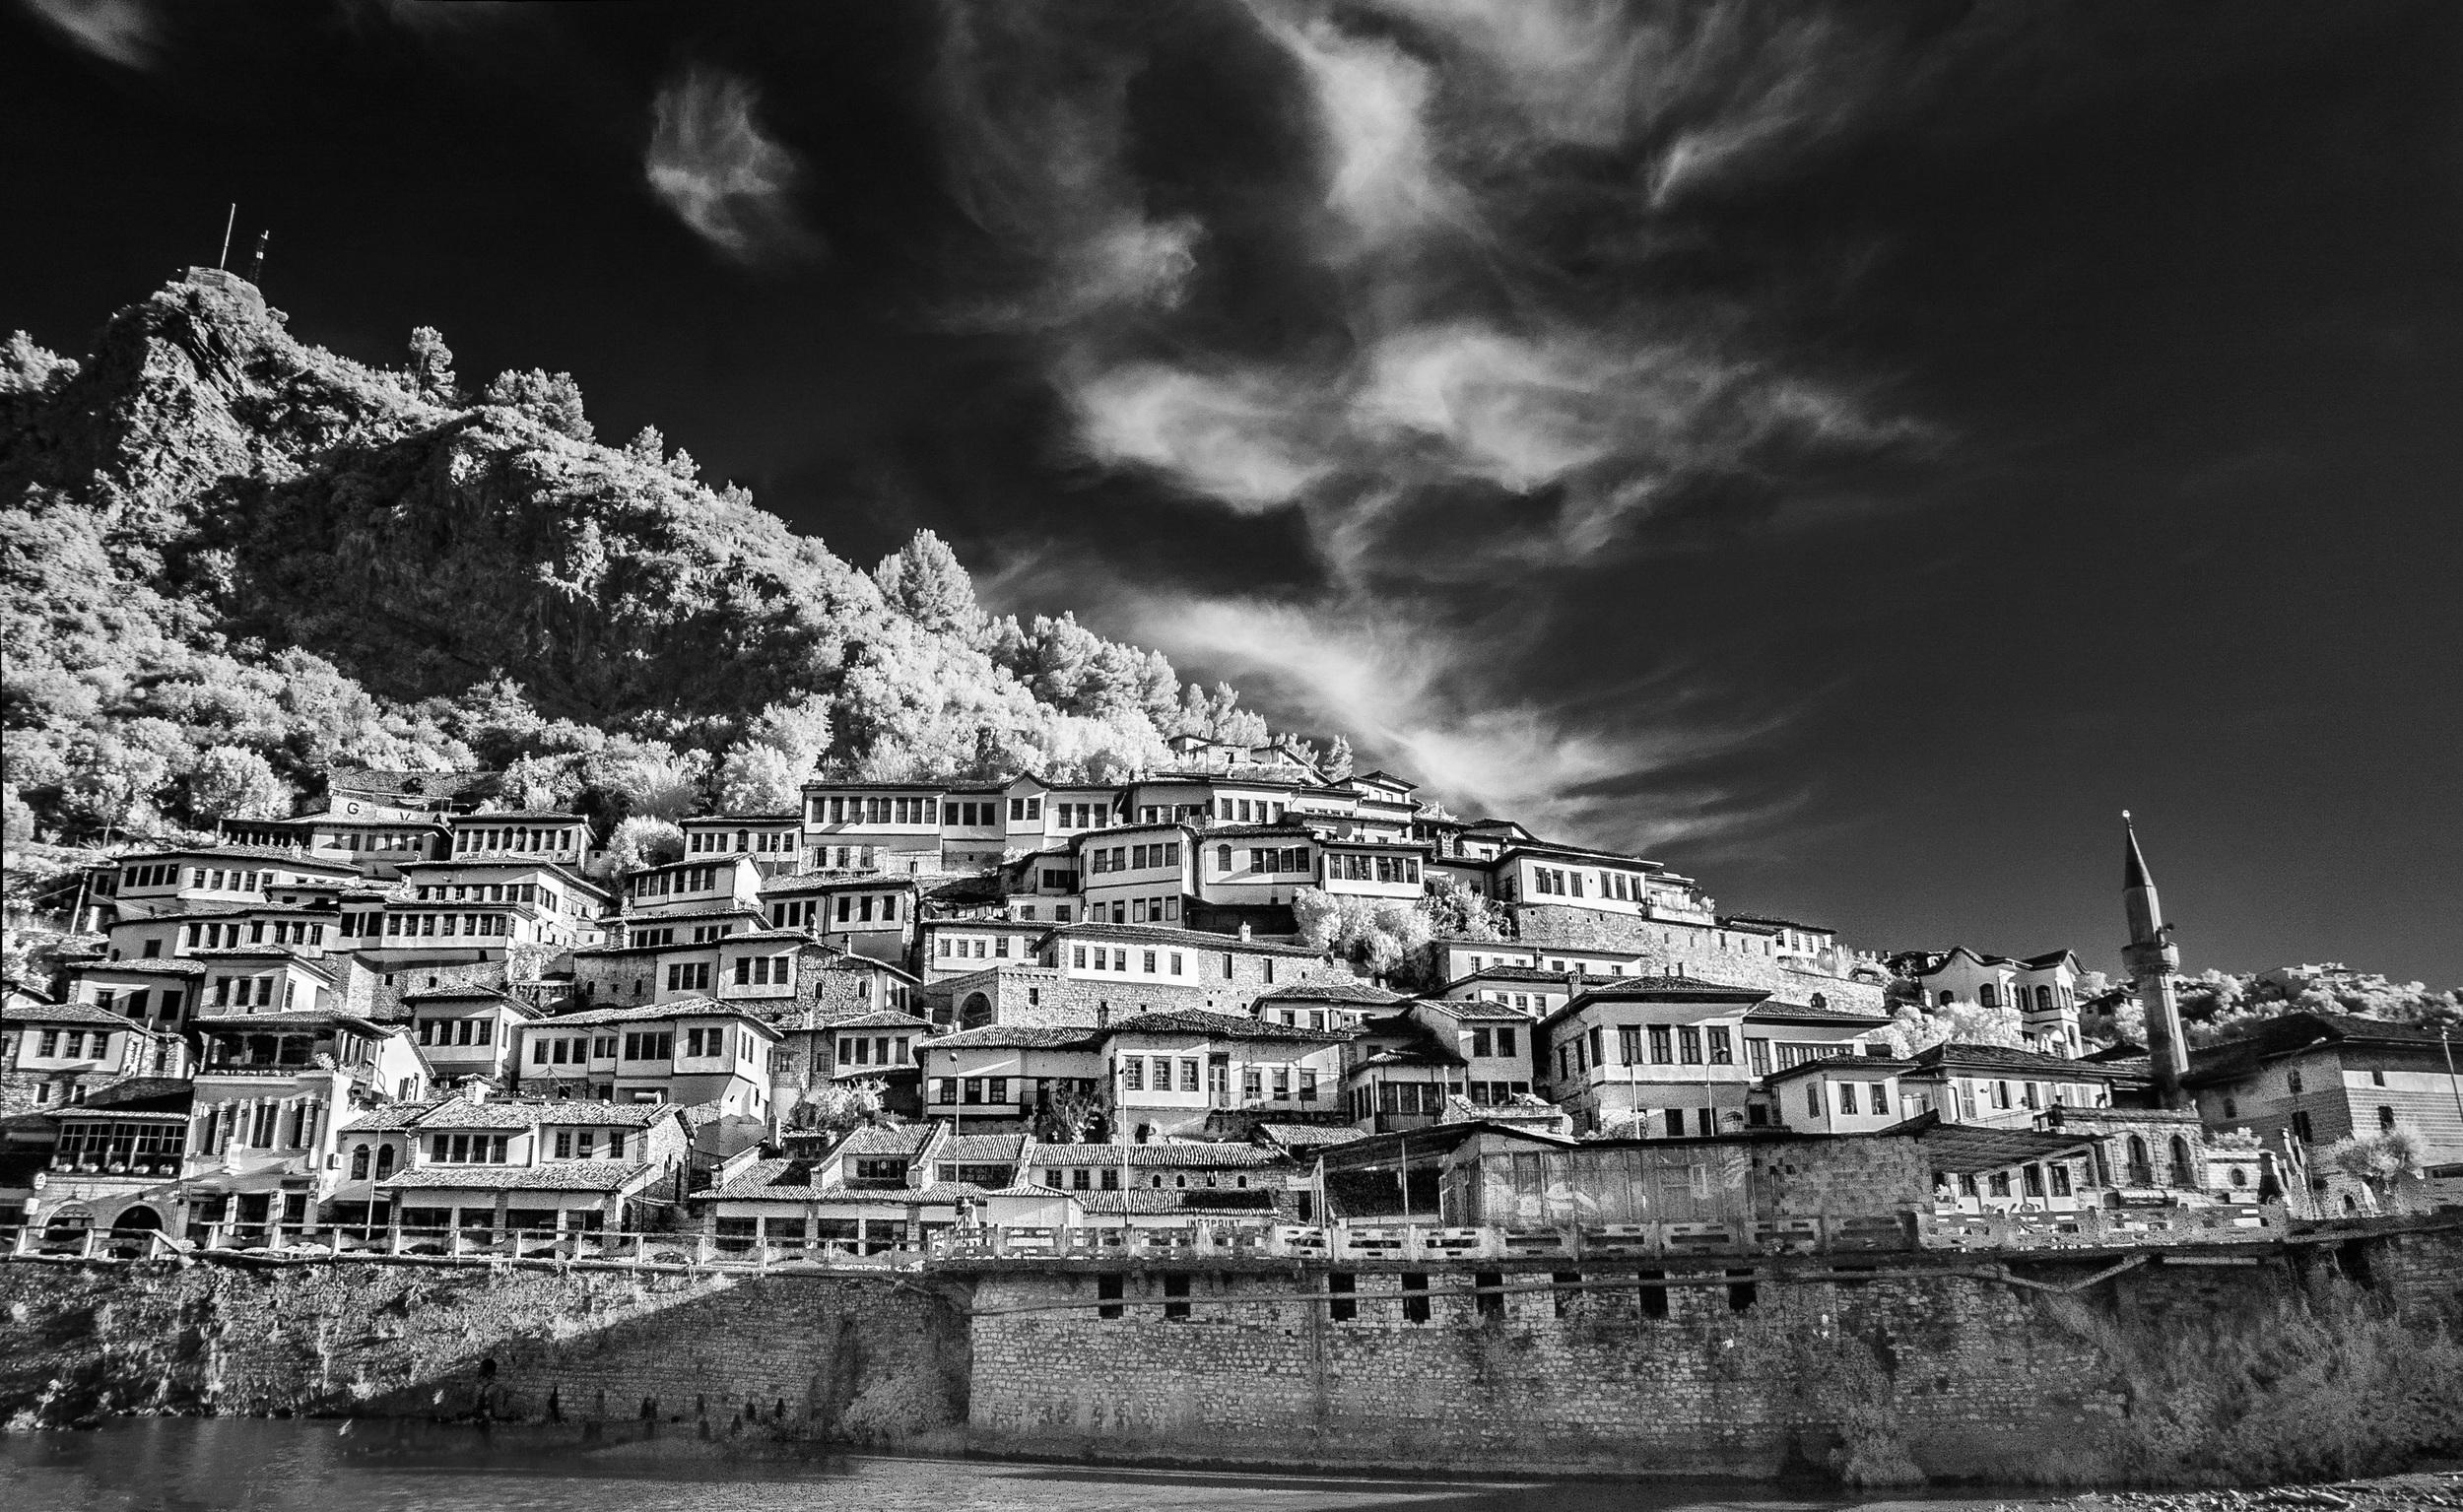 Jurick_City of a Thousand Windows, Berat, Albania 2013jpg.jpg